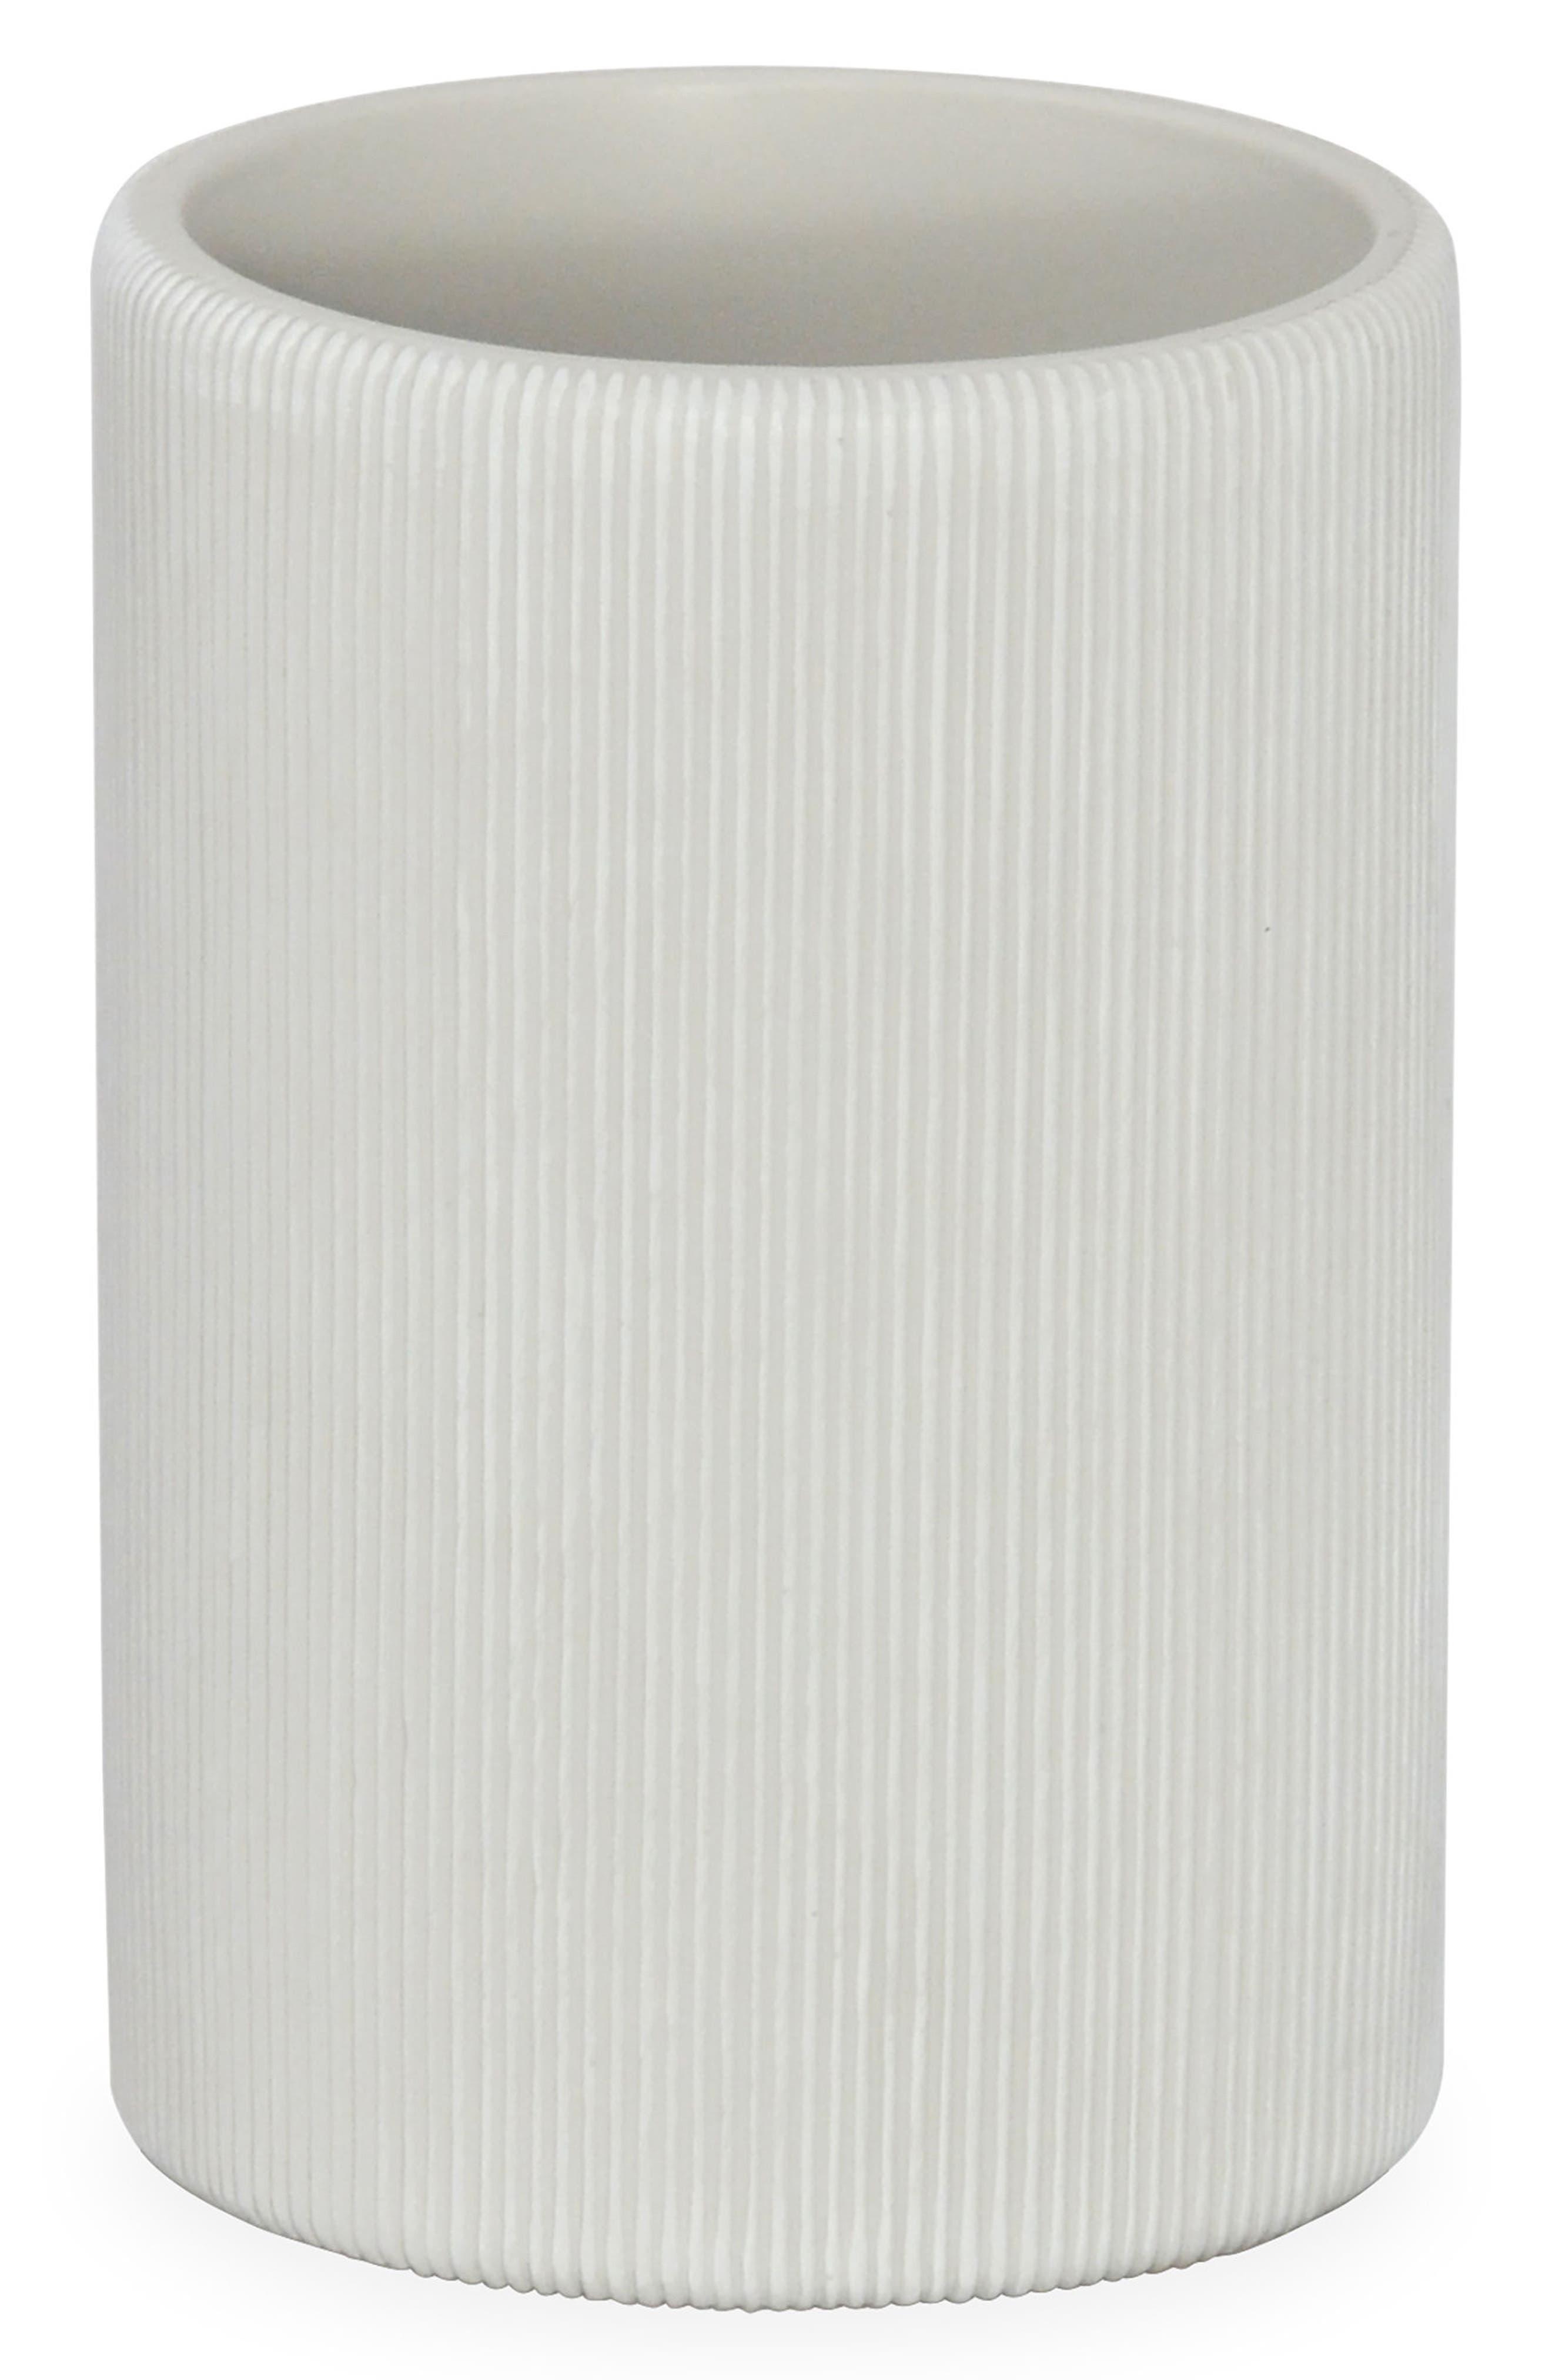 DKNY Fine Lines Ceramic Tumbler